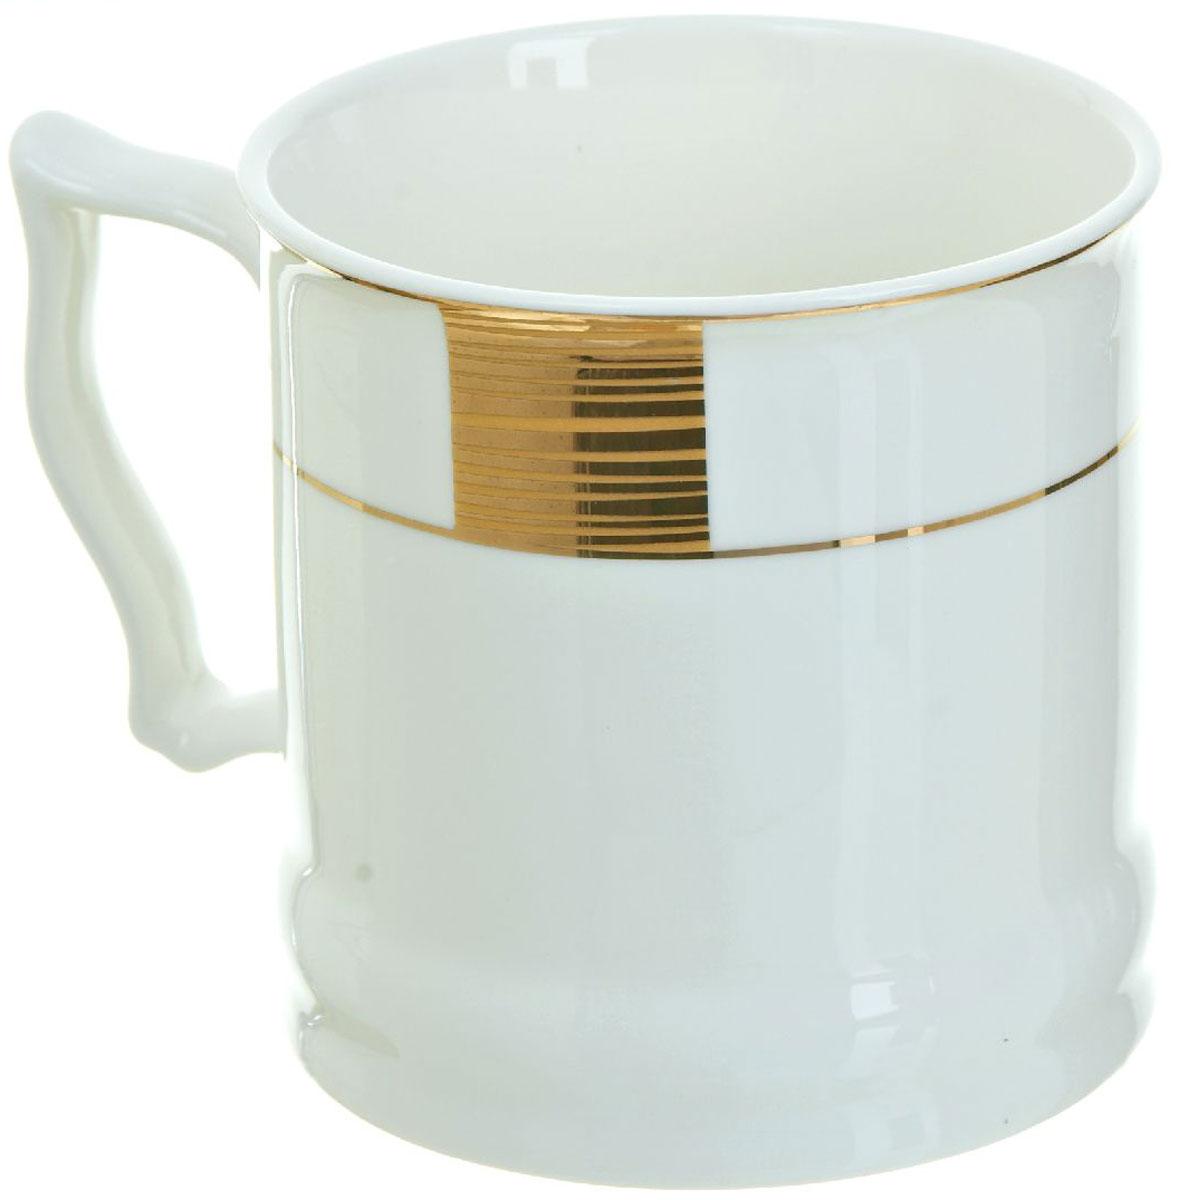 Кружка BHP Королевская кружка, 500 мл. 1870010 кружка amber porcelain сердечки 220 мл